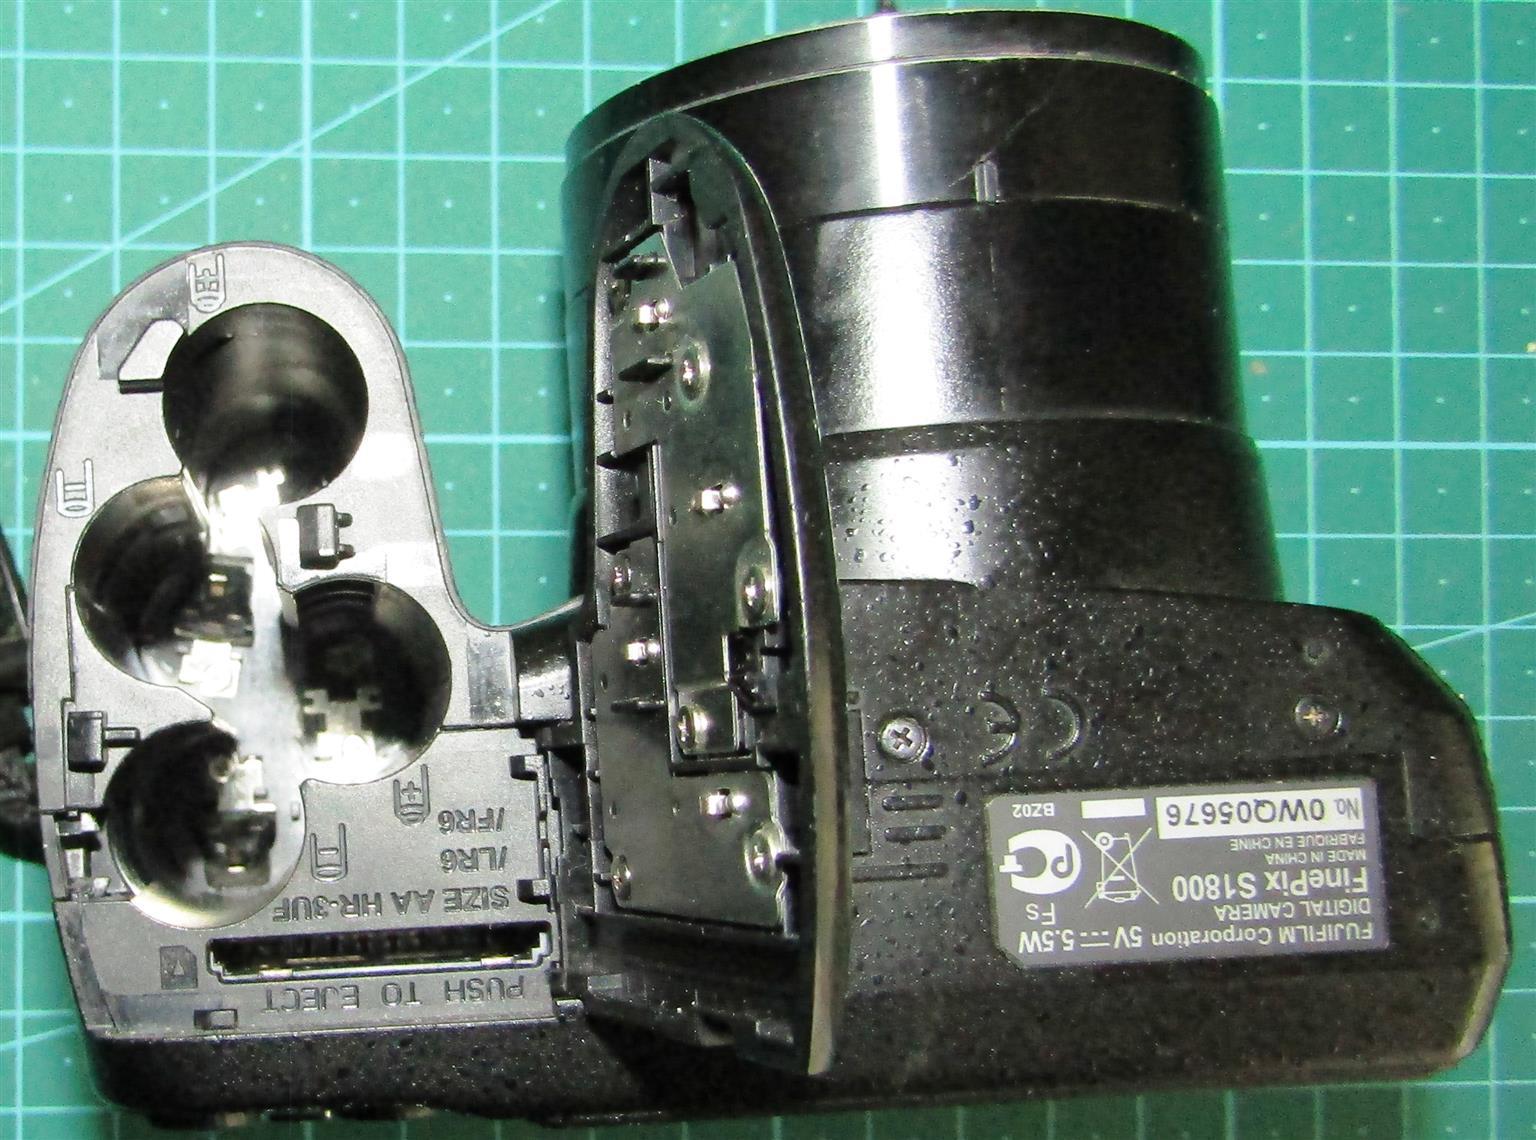 Fujifilm FinePix S1800 - NOT WORKING